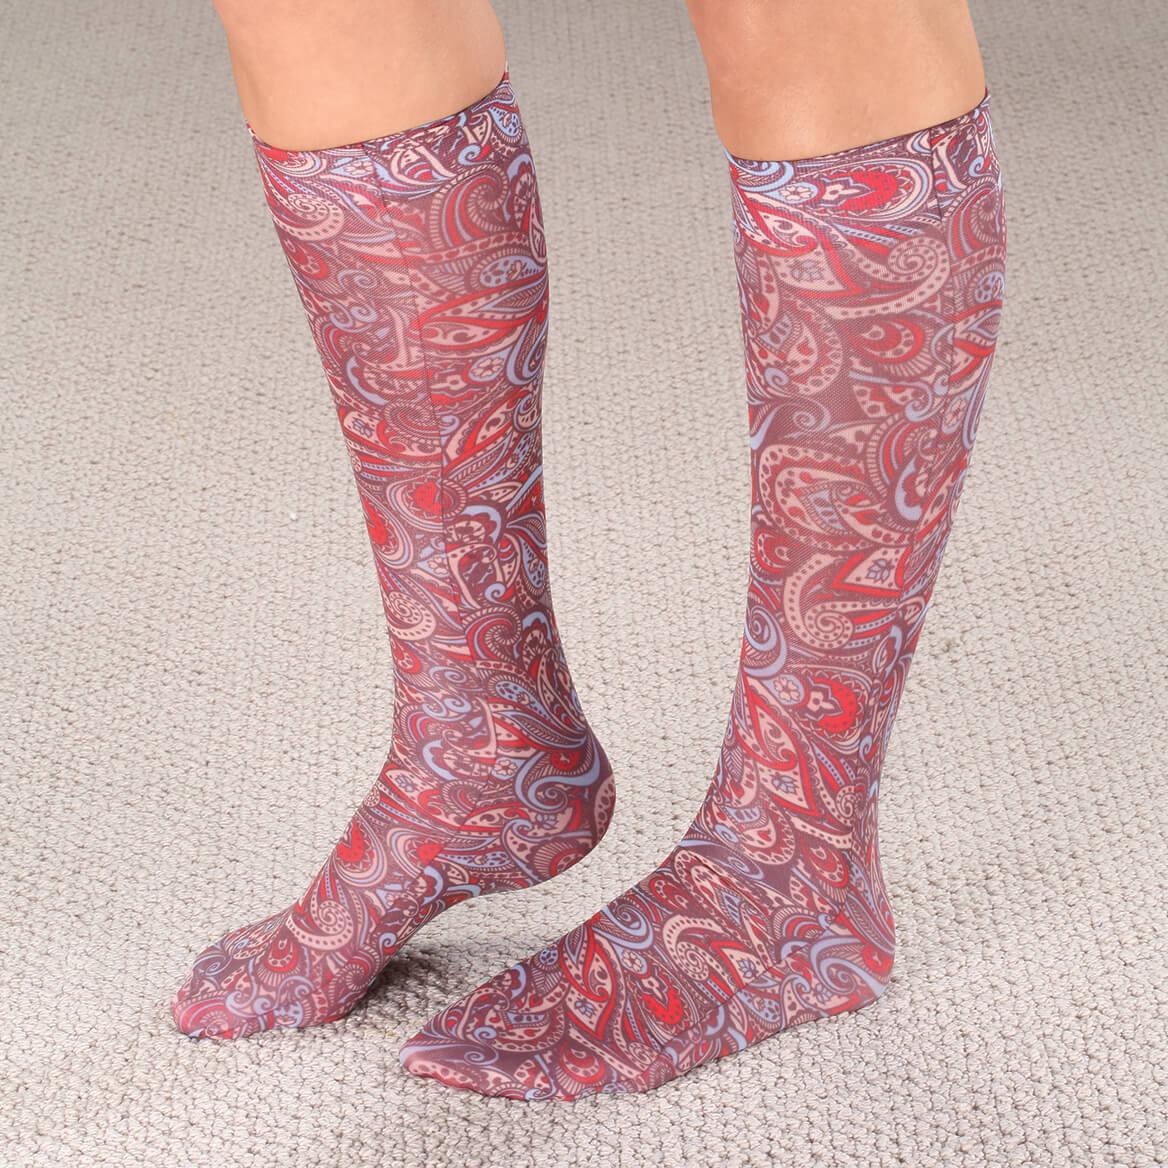 Celeste Stein Compression Socks, 8–15 mmHg-352877